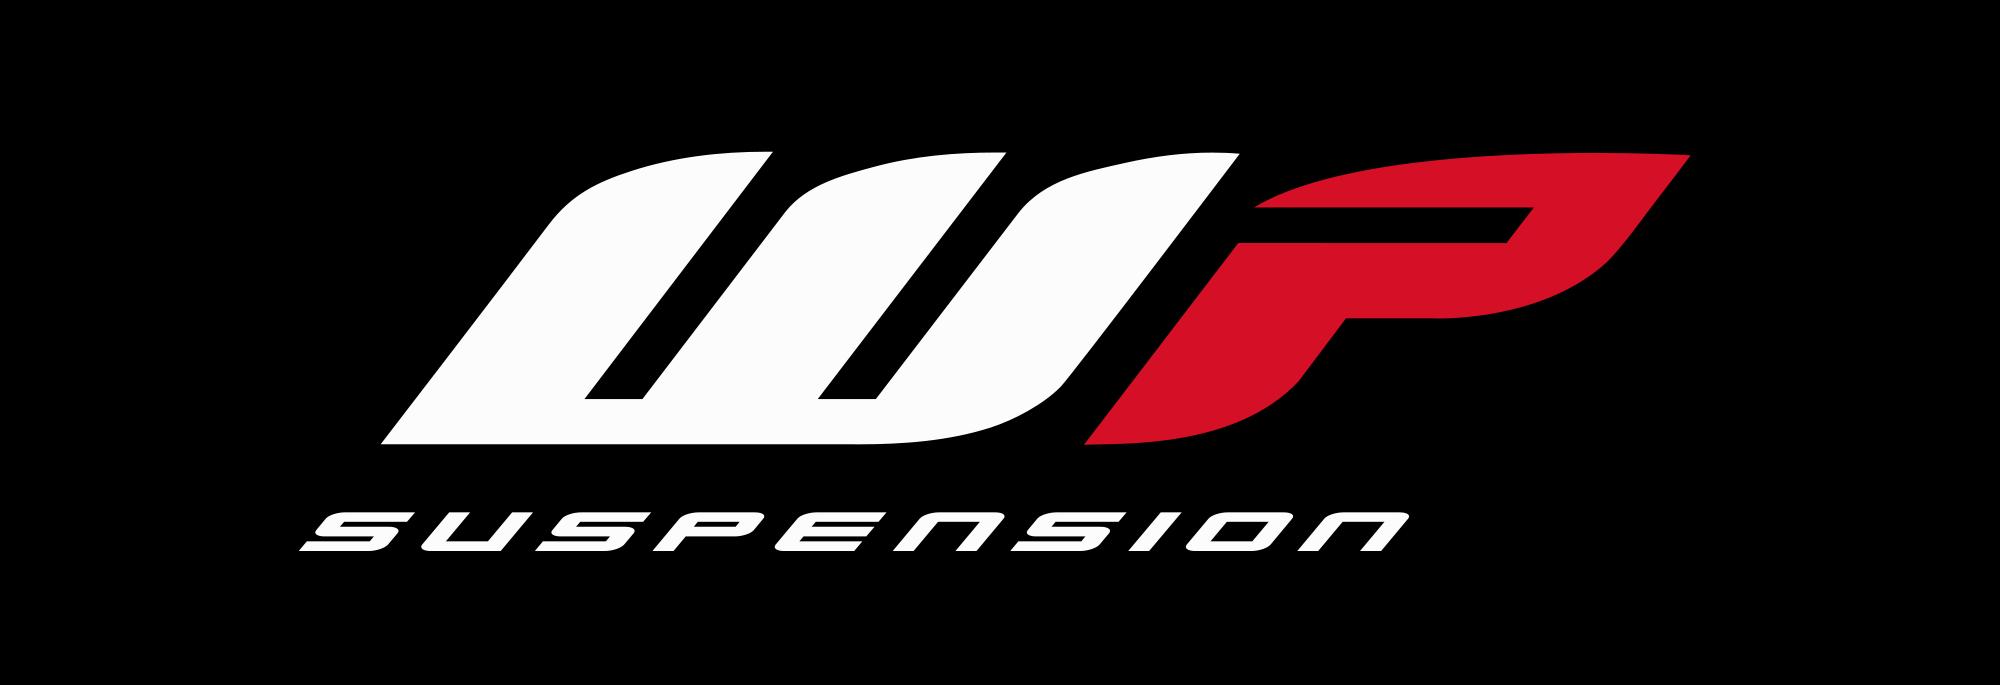 2000x685 Filewp Suspension Logo.svg